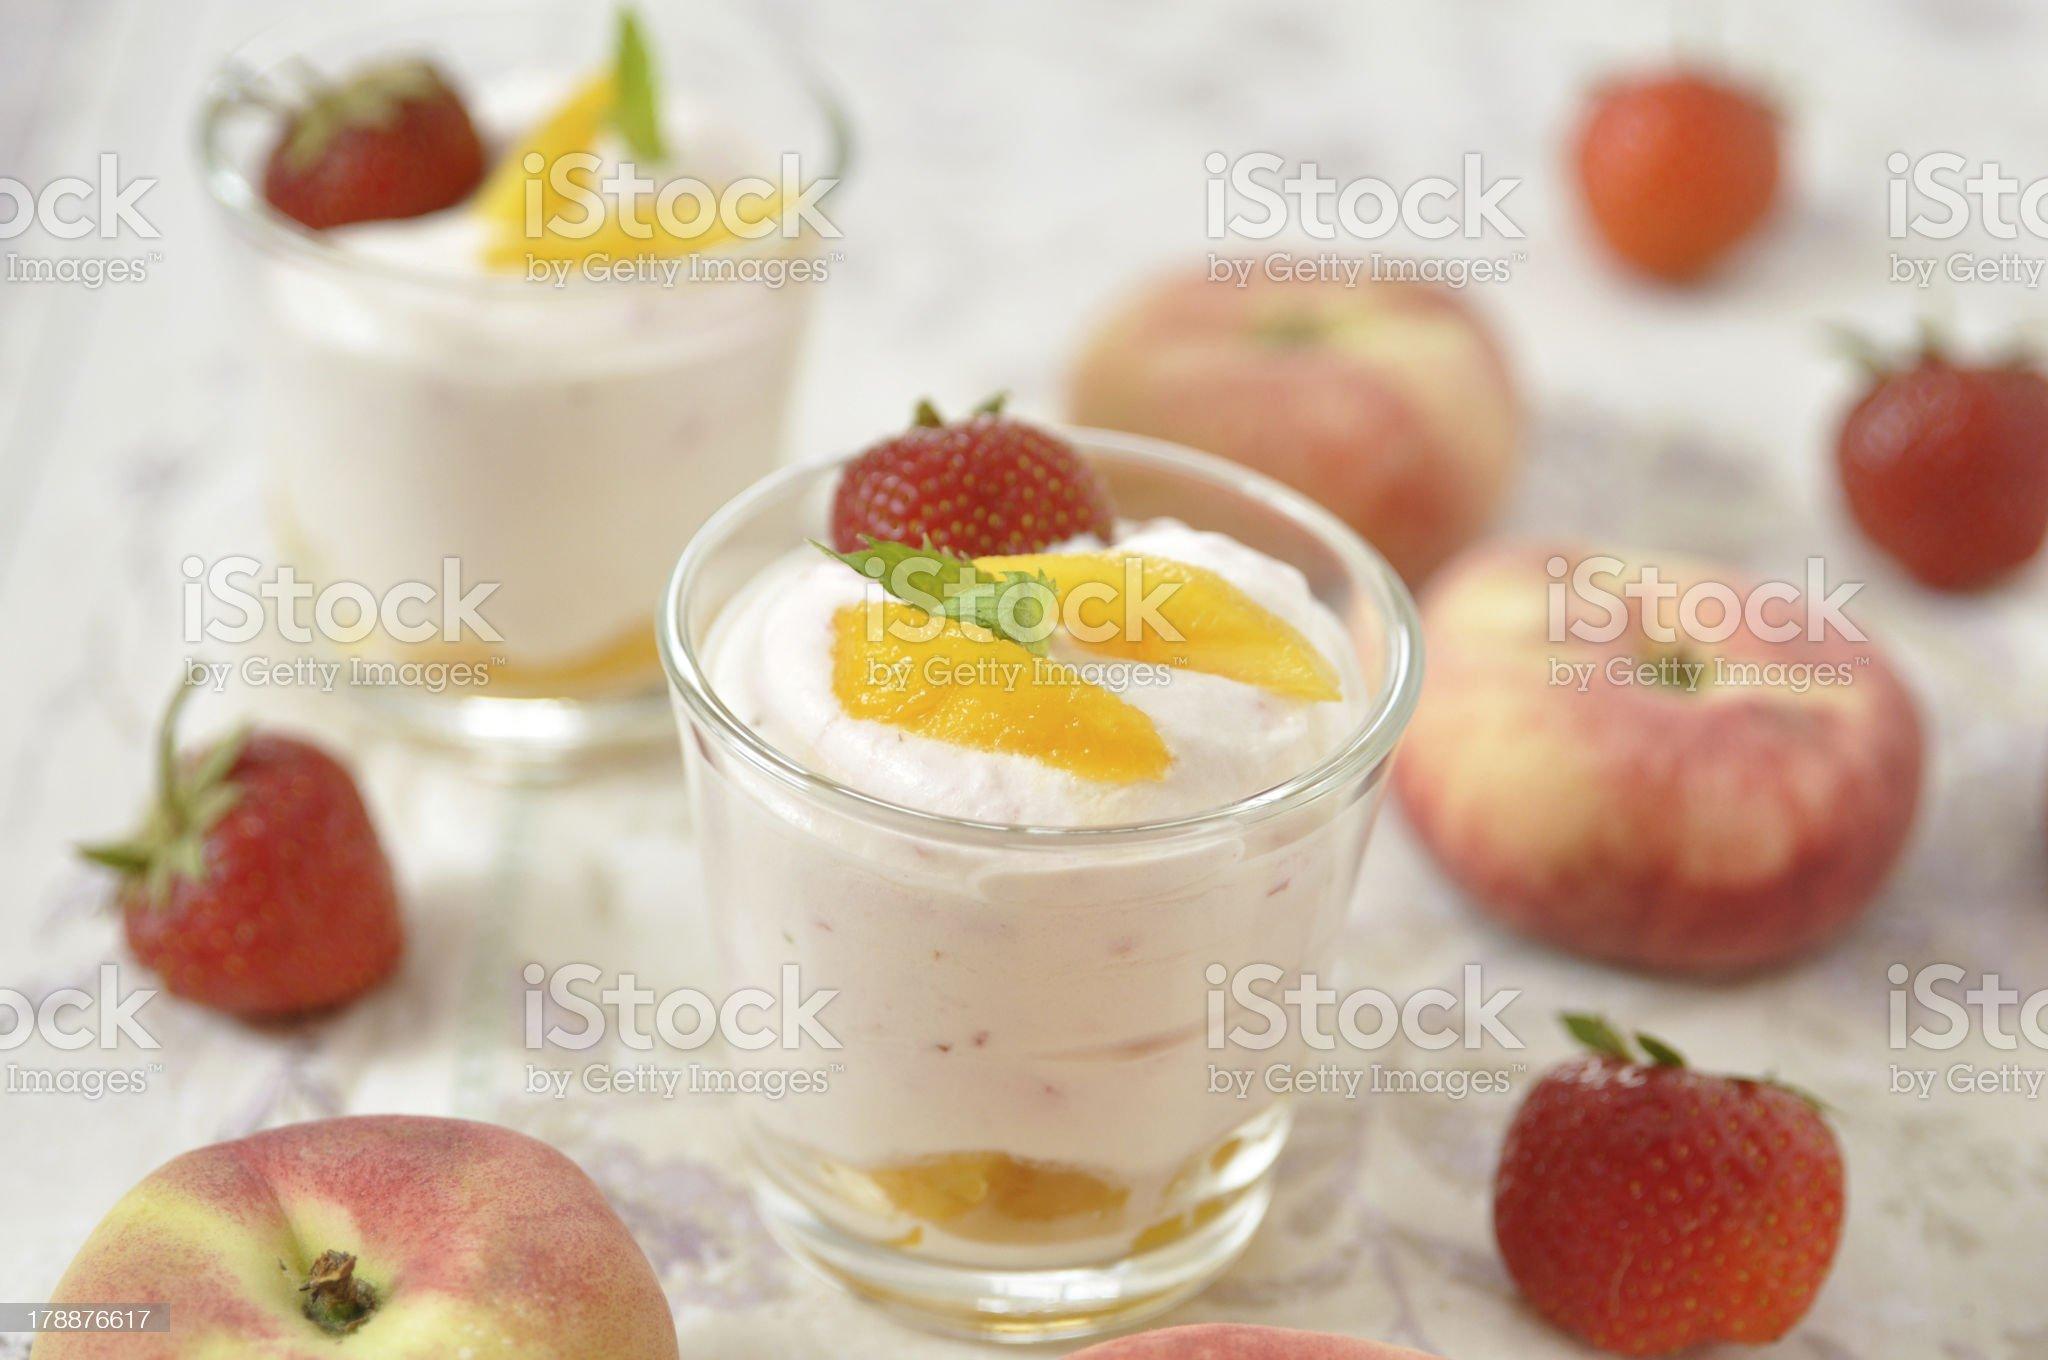 creamy strawberry and peach desserts royalty-free stock photo